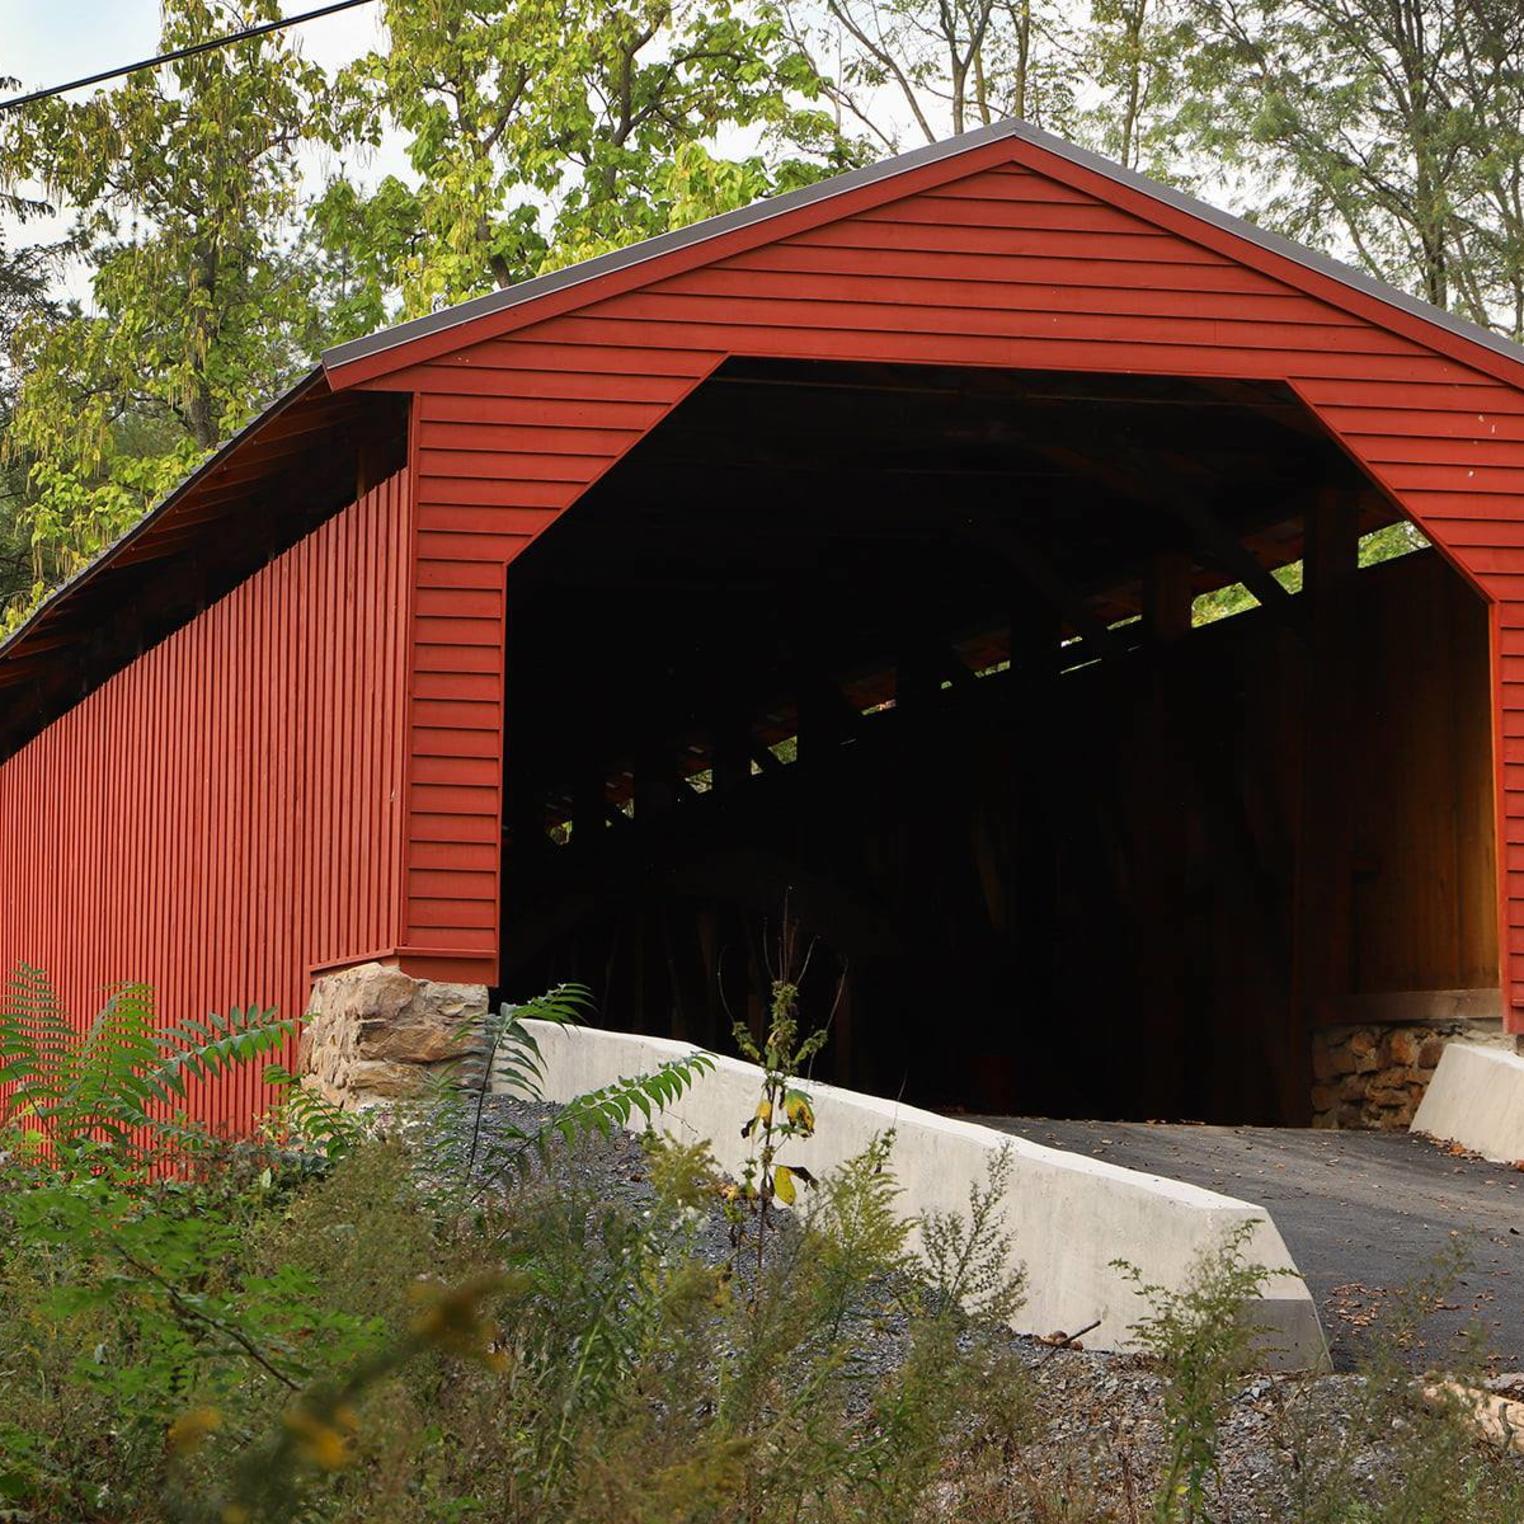 Ramp Covered Bridge